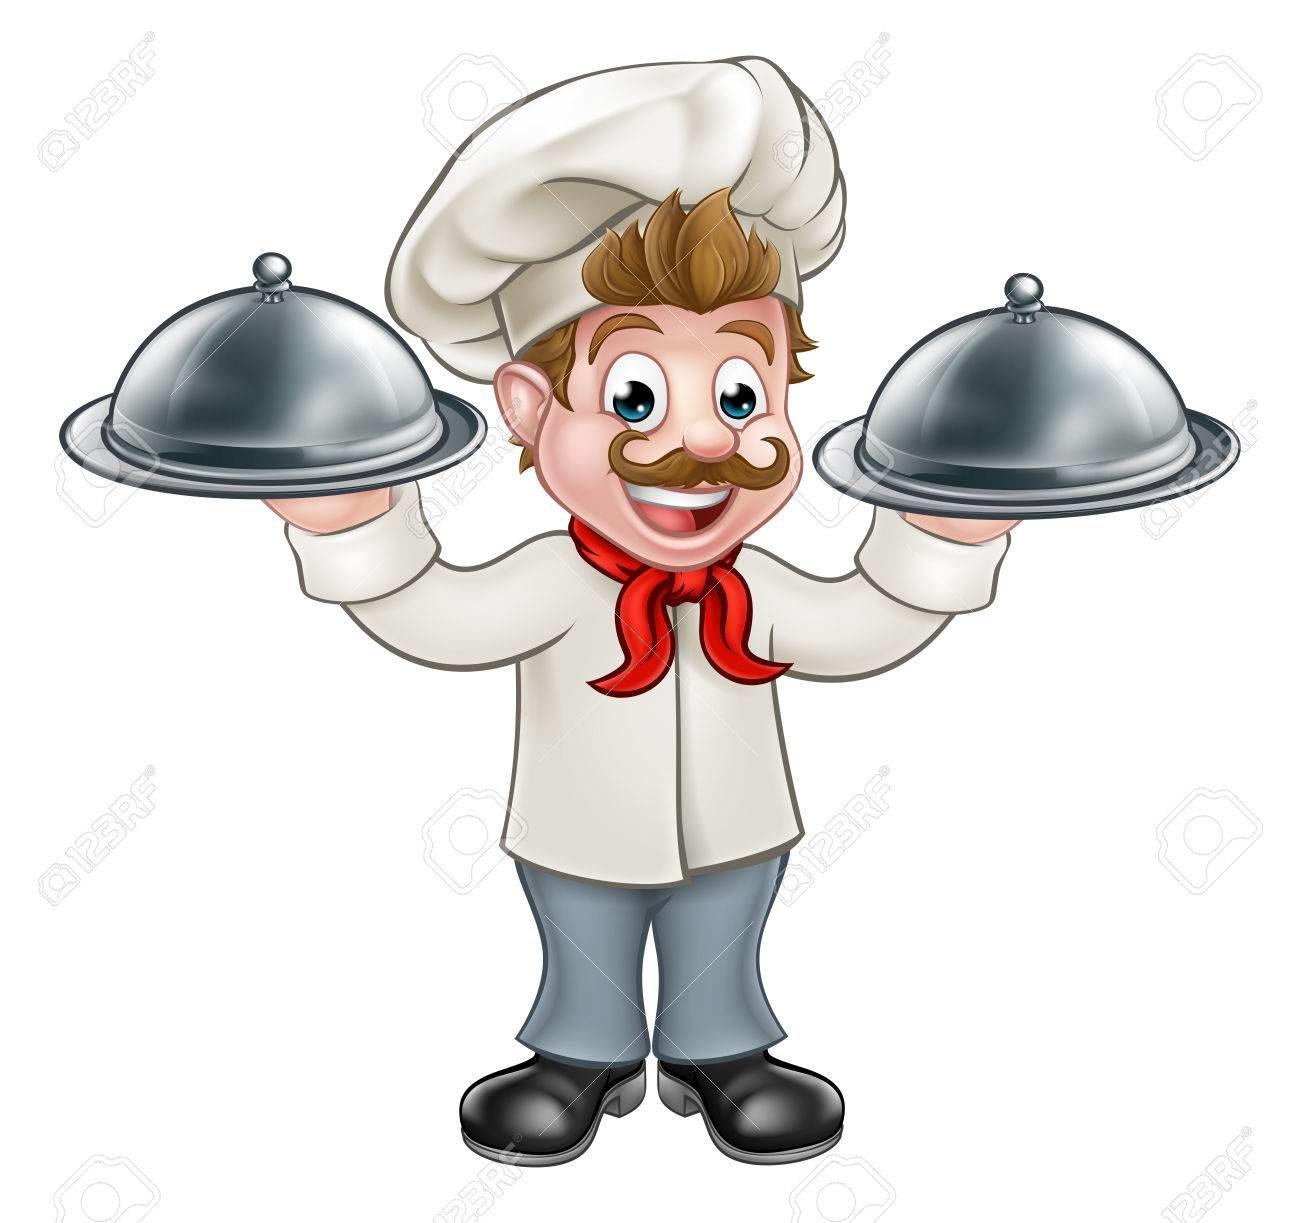 84366700-chef-cuisinier-personnage-de-dessin-animé-mascotte-vector-illustration-.jpg